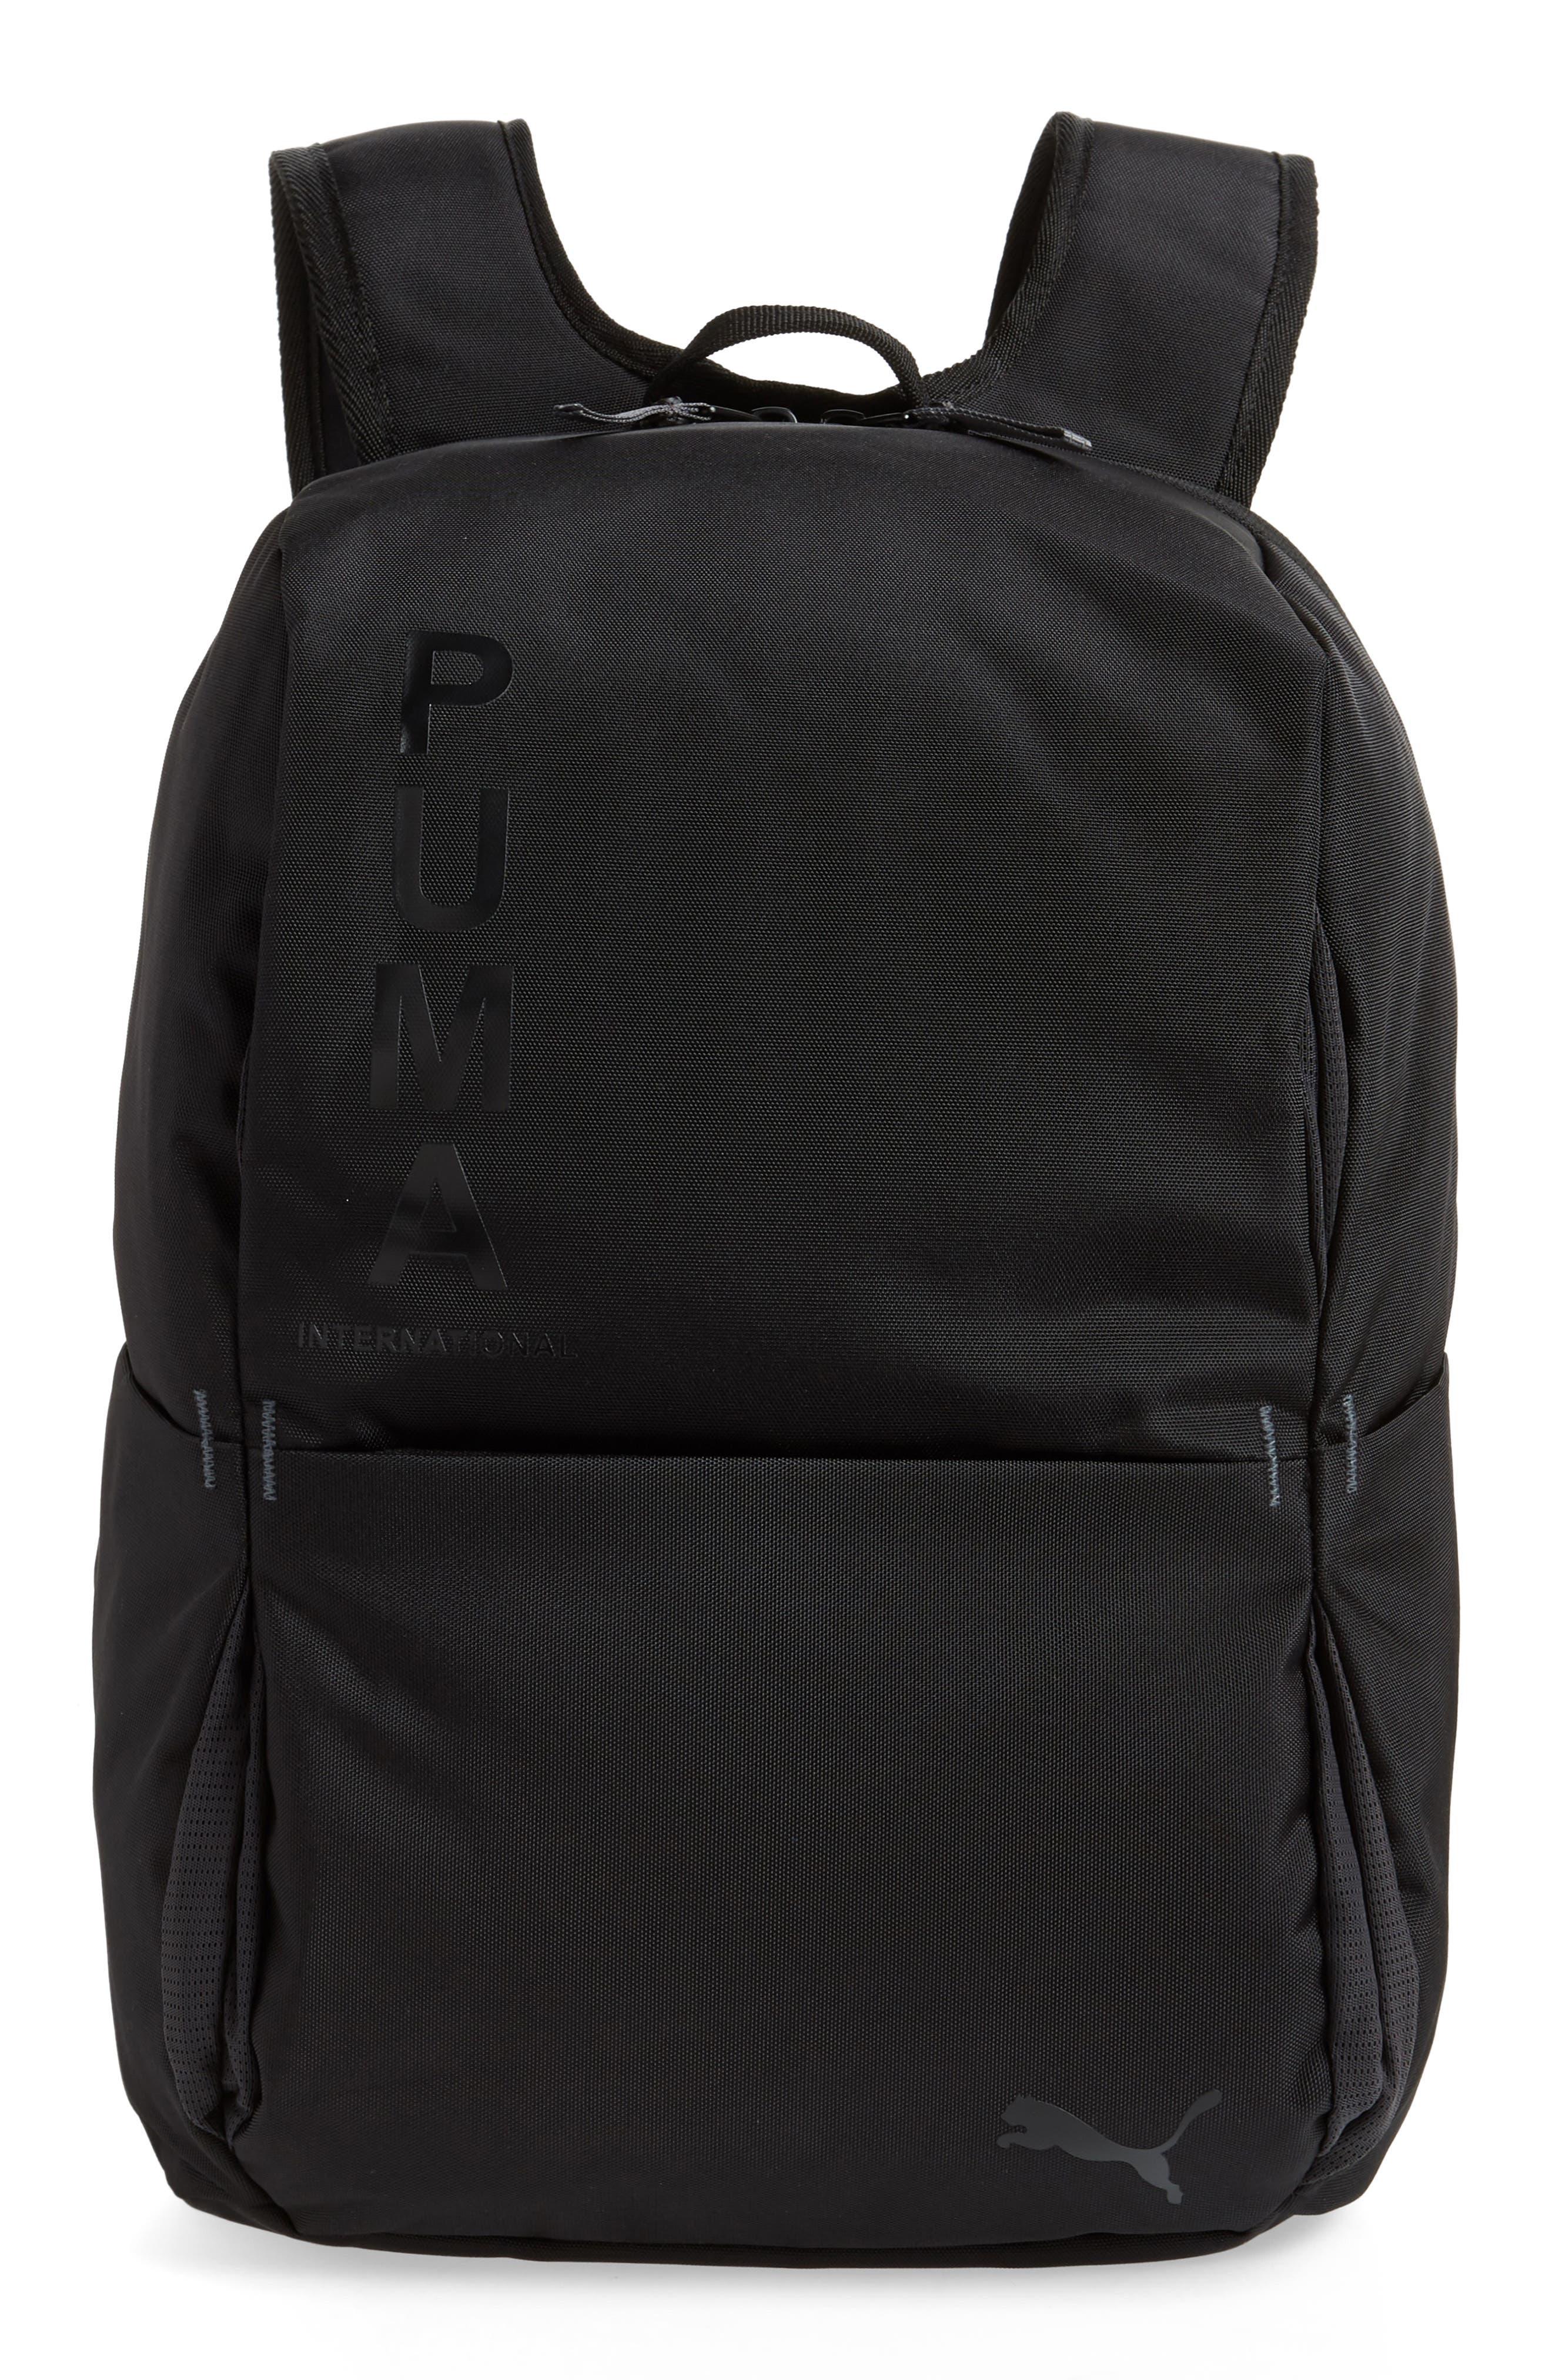 Ace Backpack,                             Main thumbnail 1, color,                             BLACK